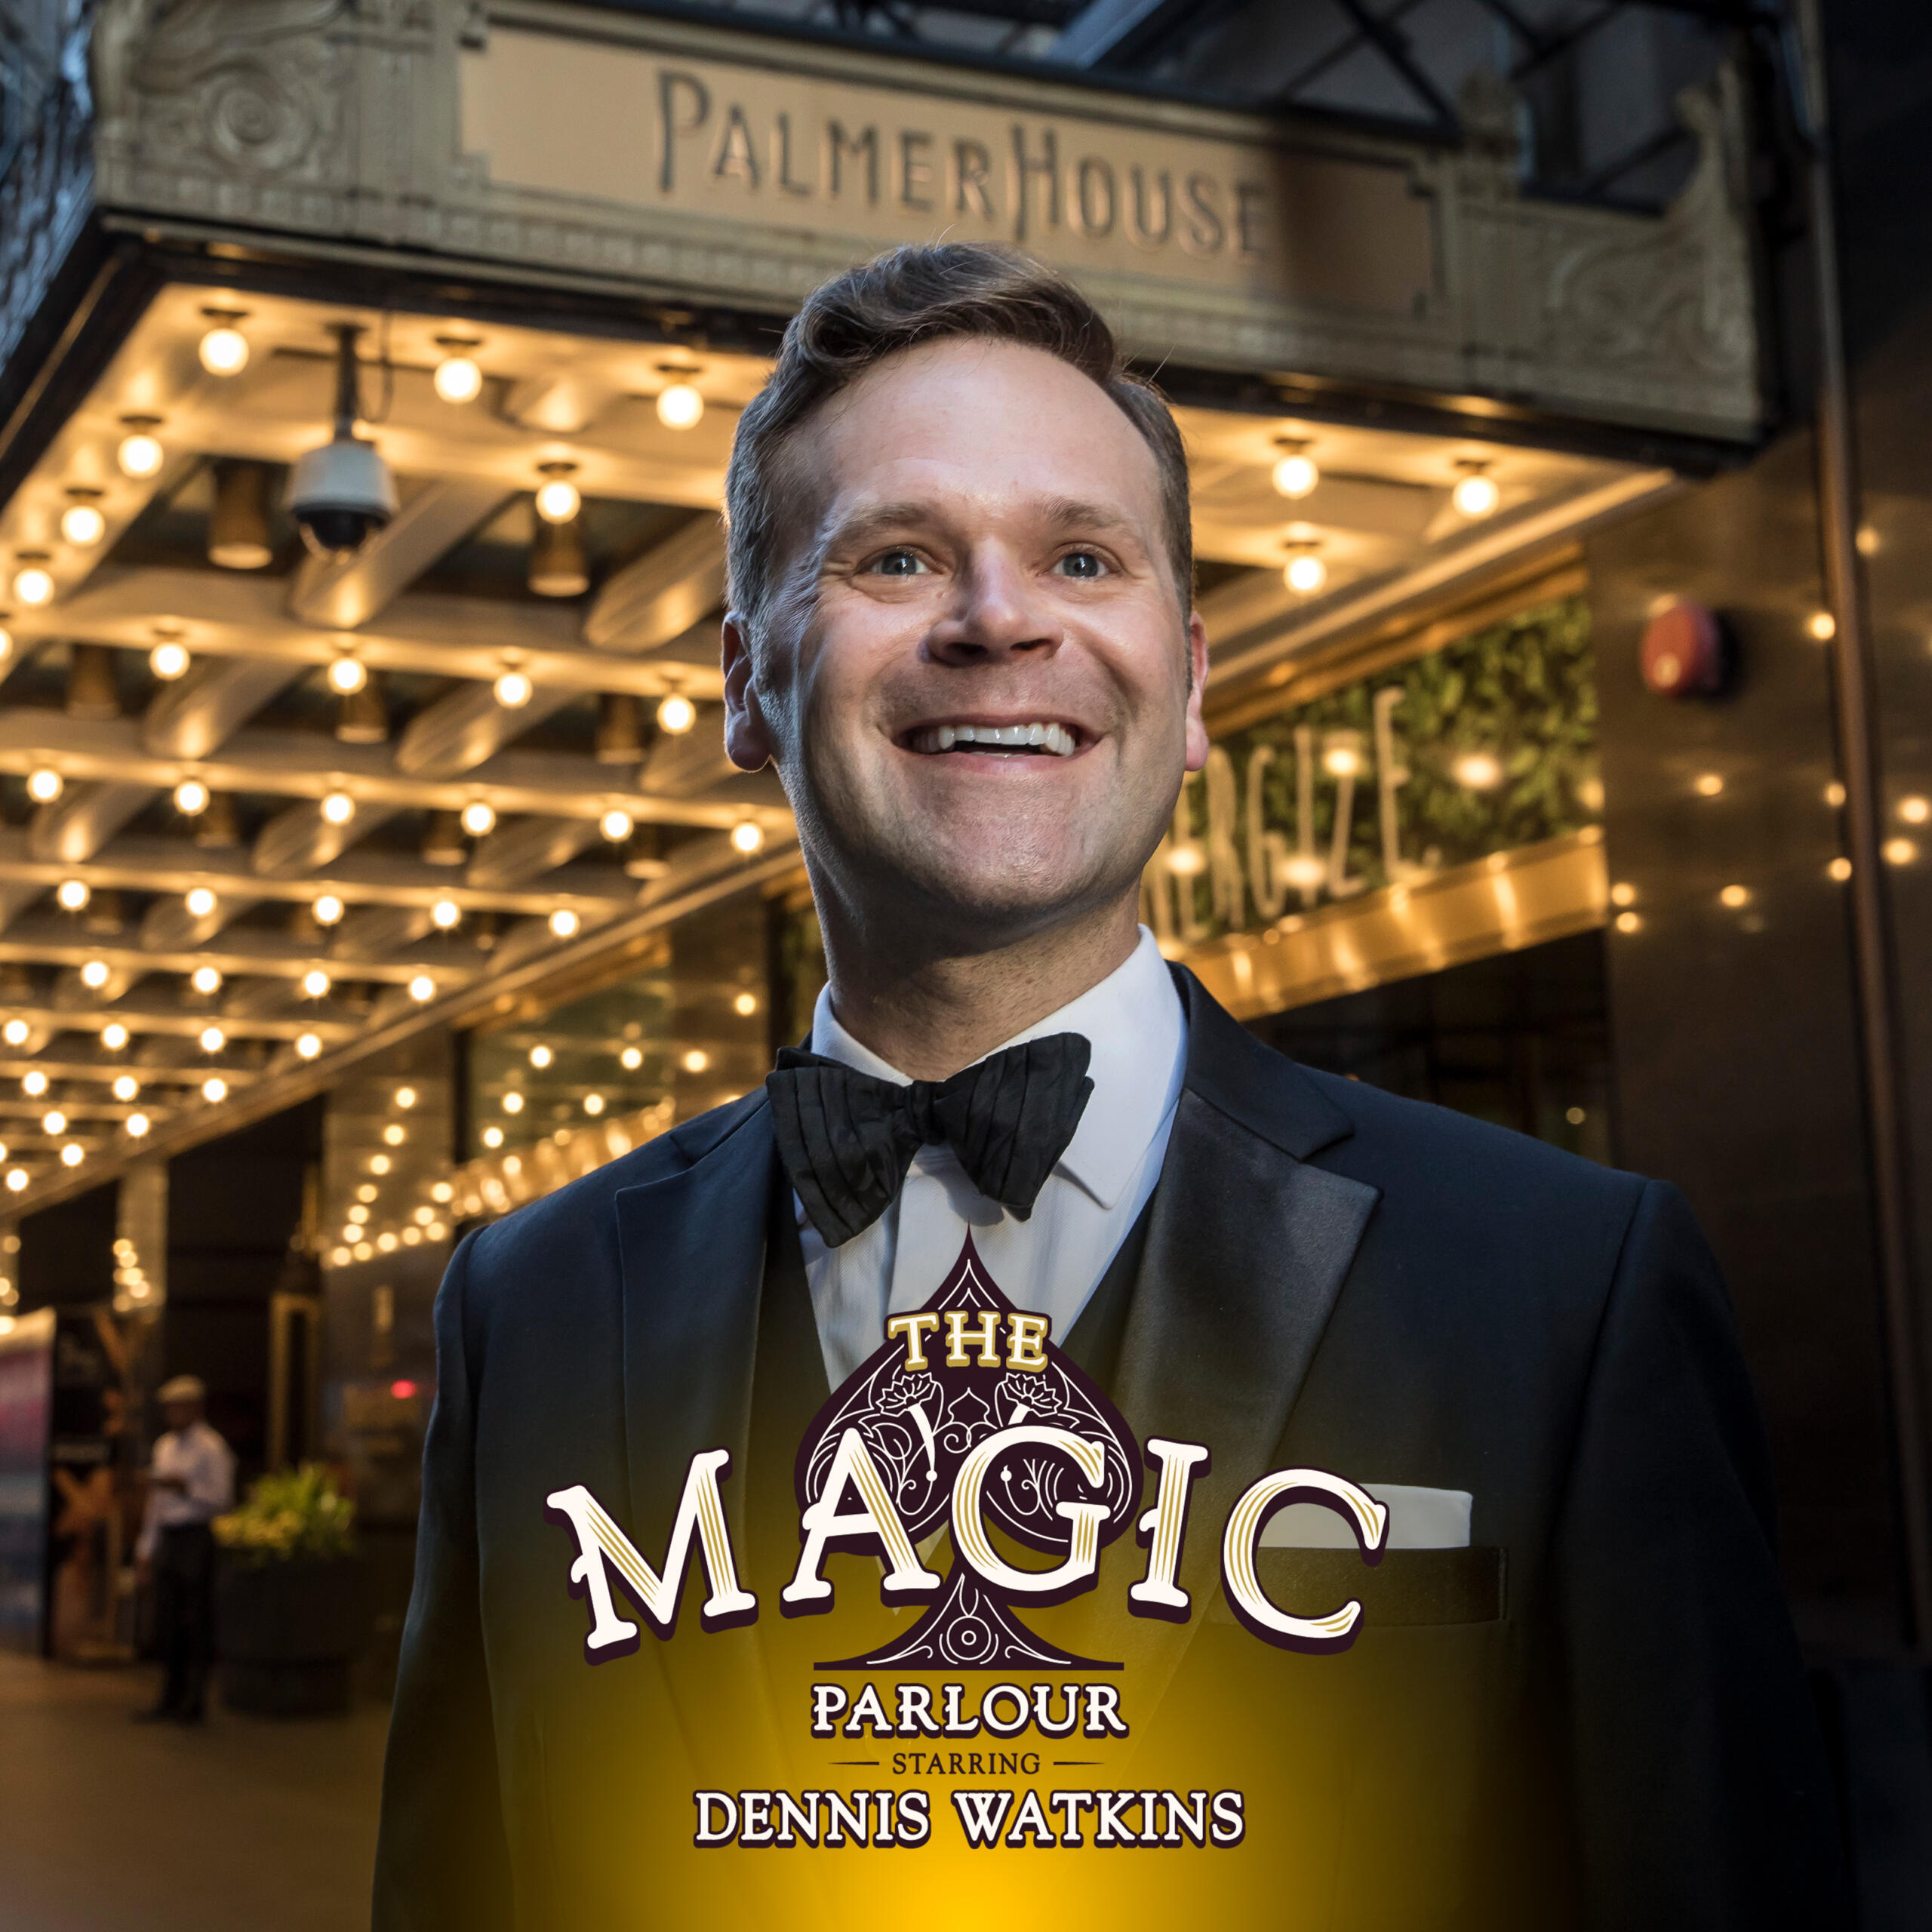 Dennis Watkins' The Magic Parlour